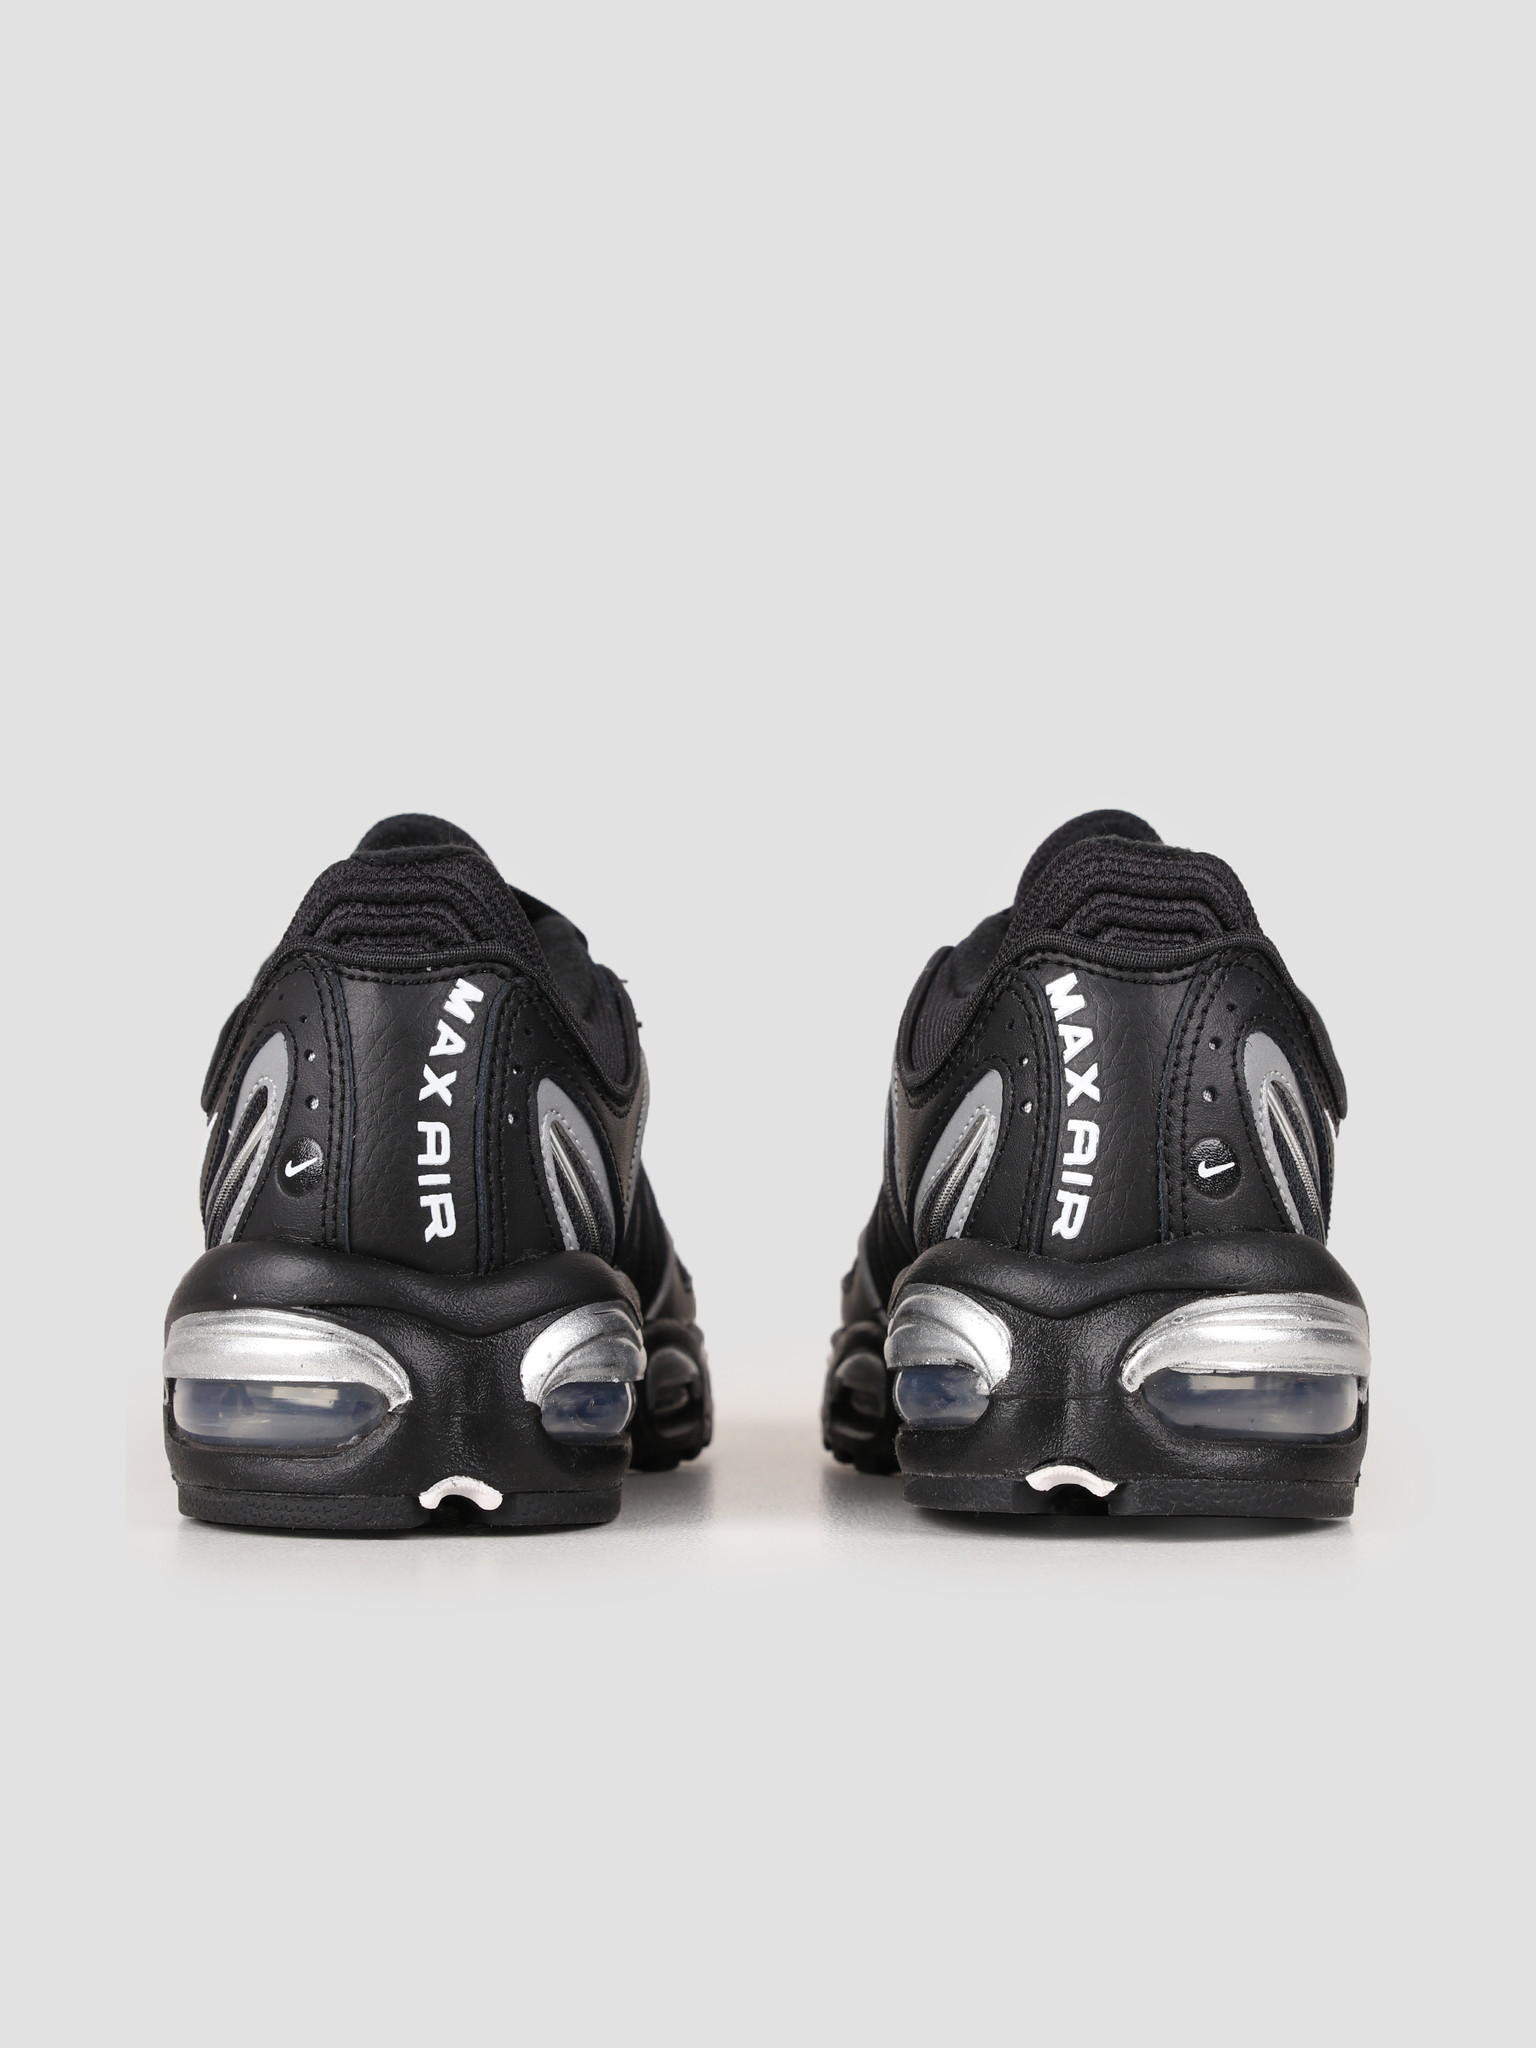 Nike Nike Air Max Tailwind Iv Black White Metallic Silver AQ2567-003